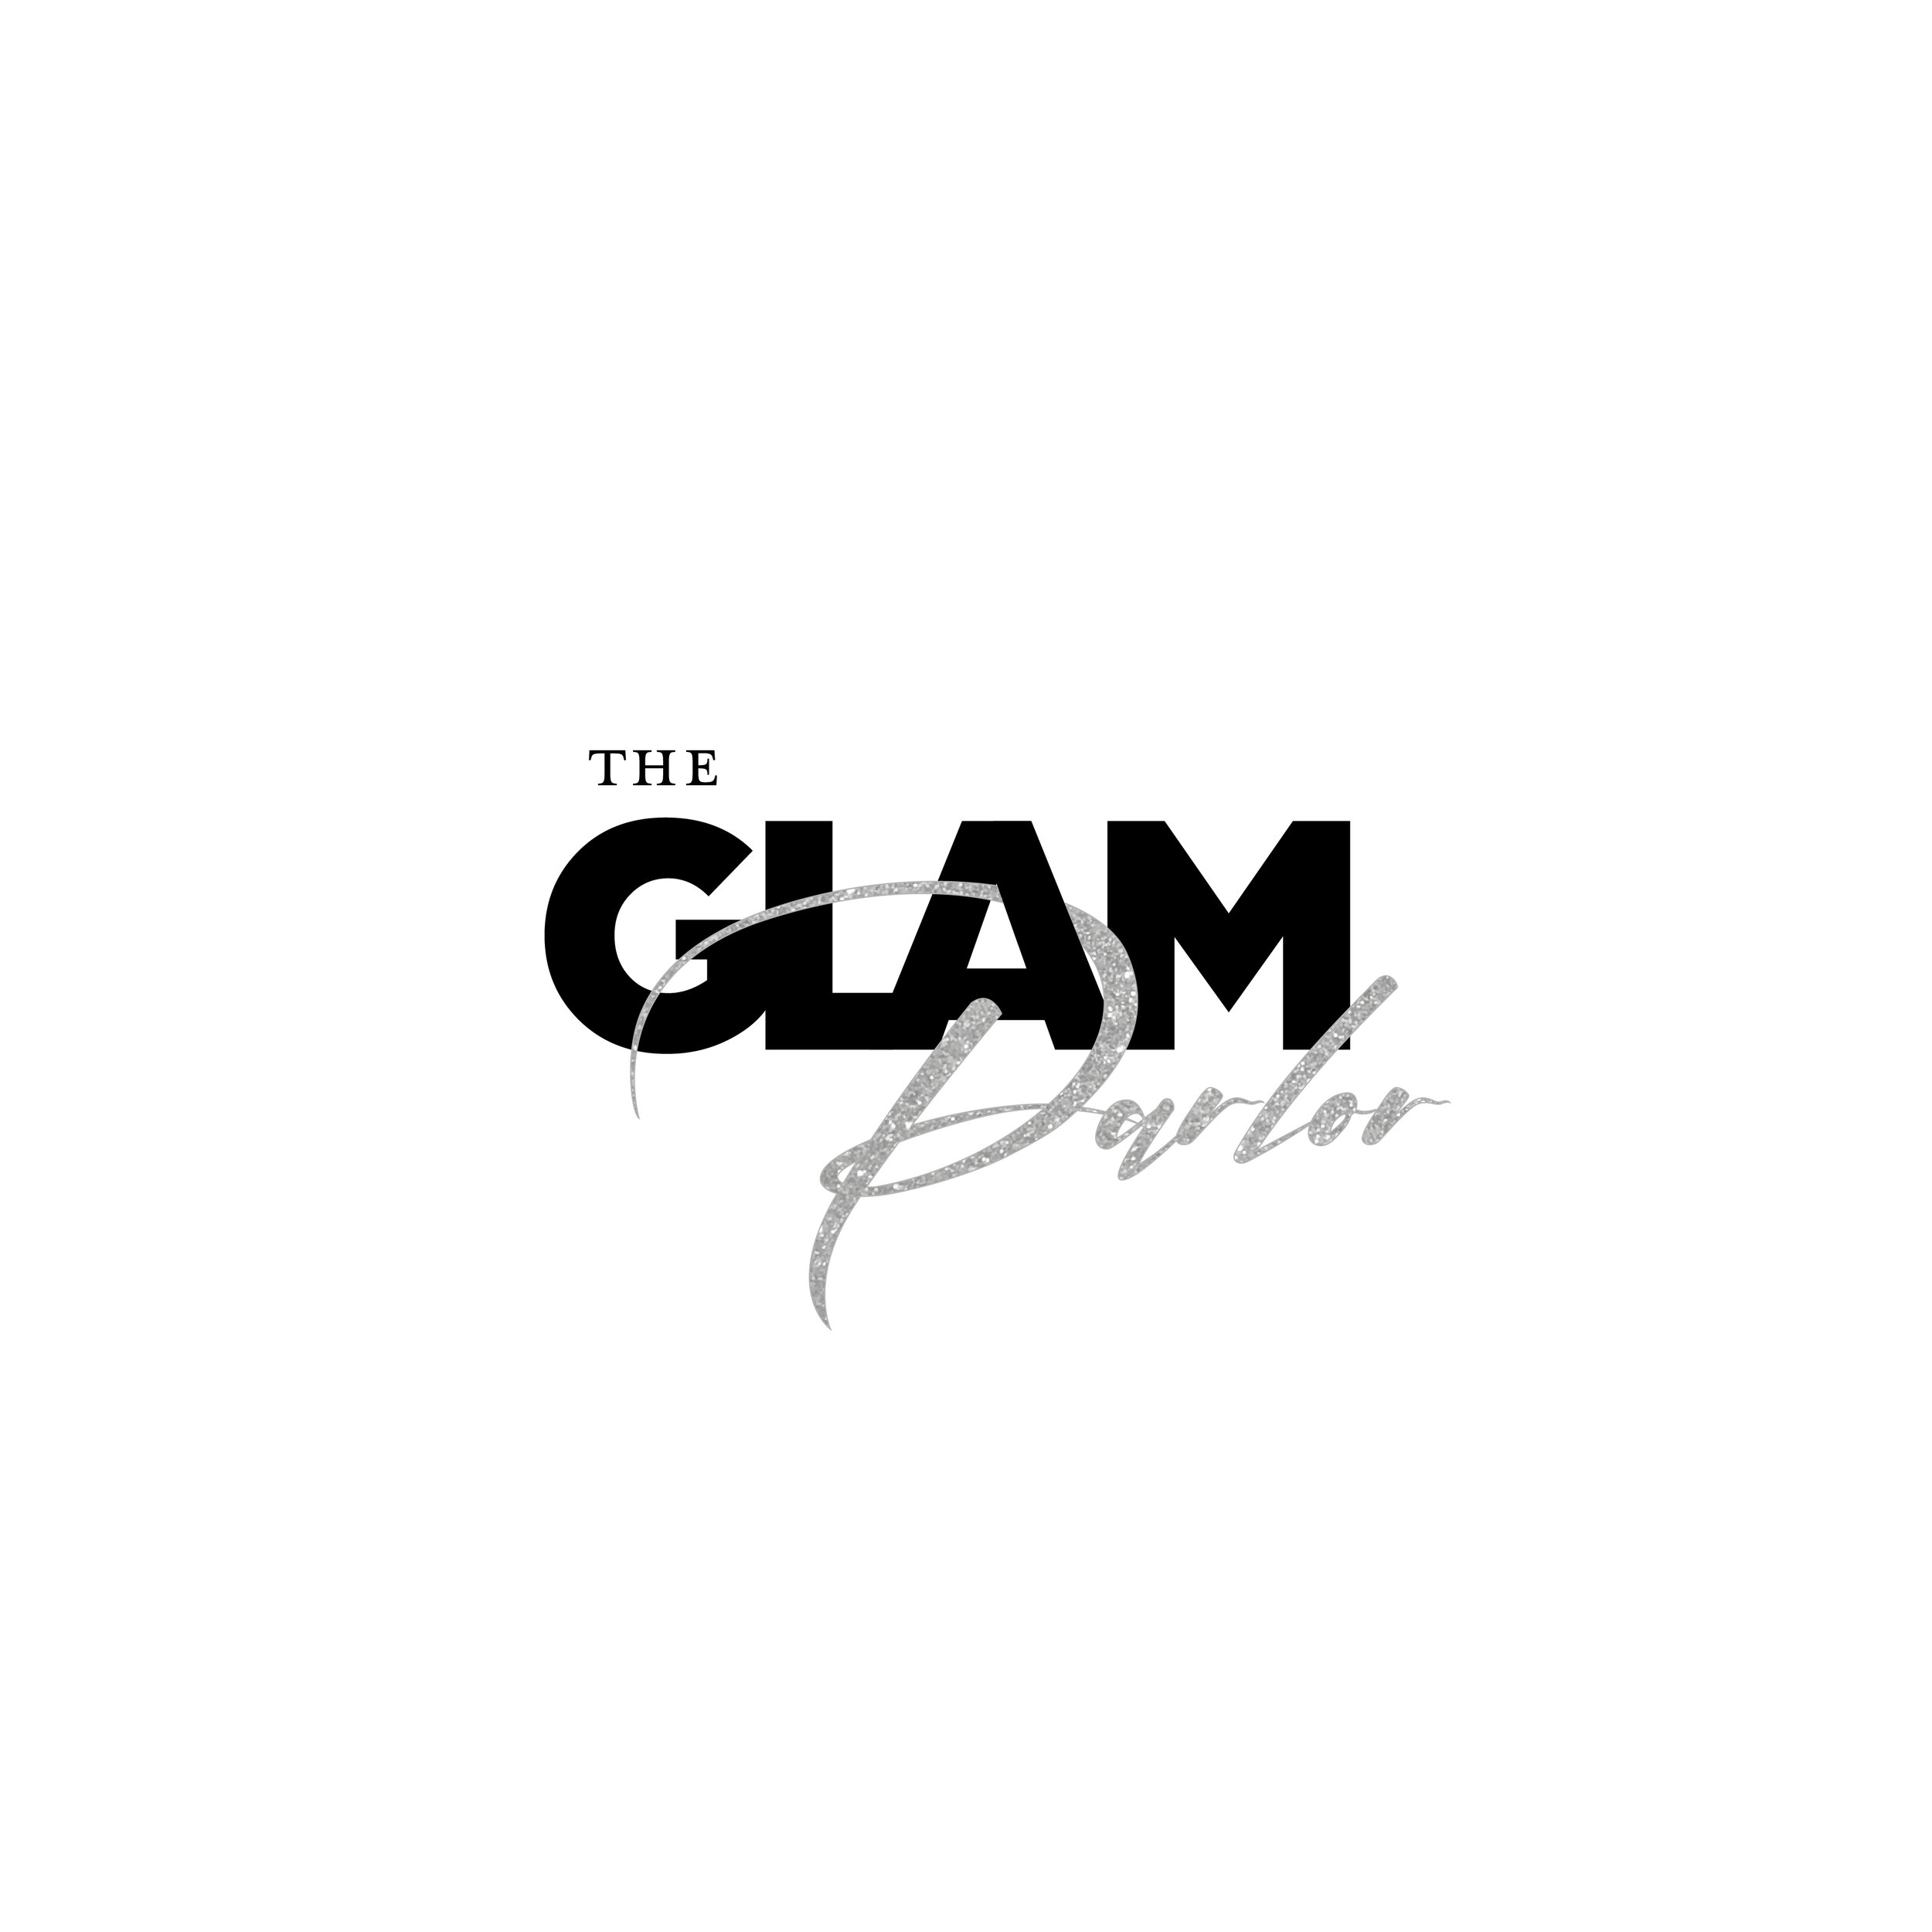 GLAM PARLOR W.jpg